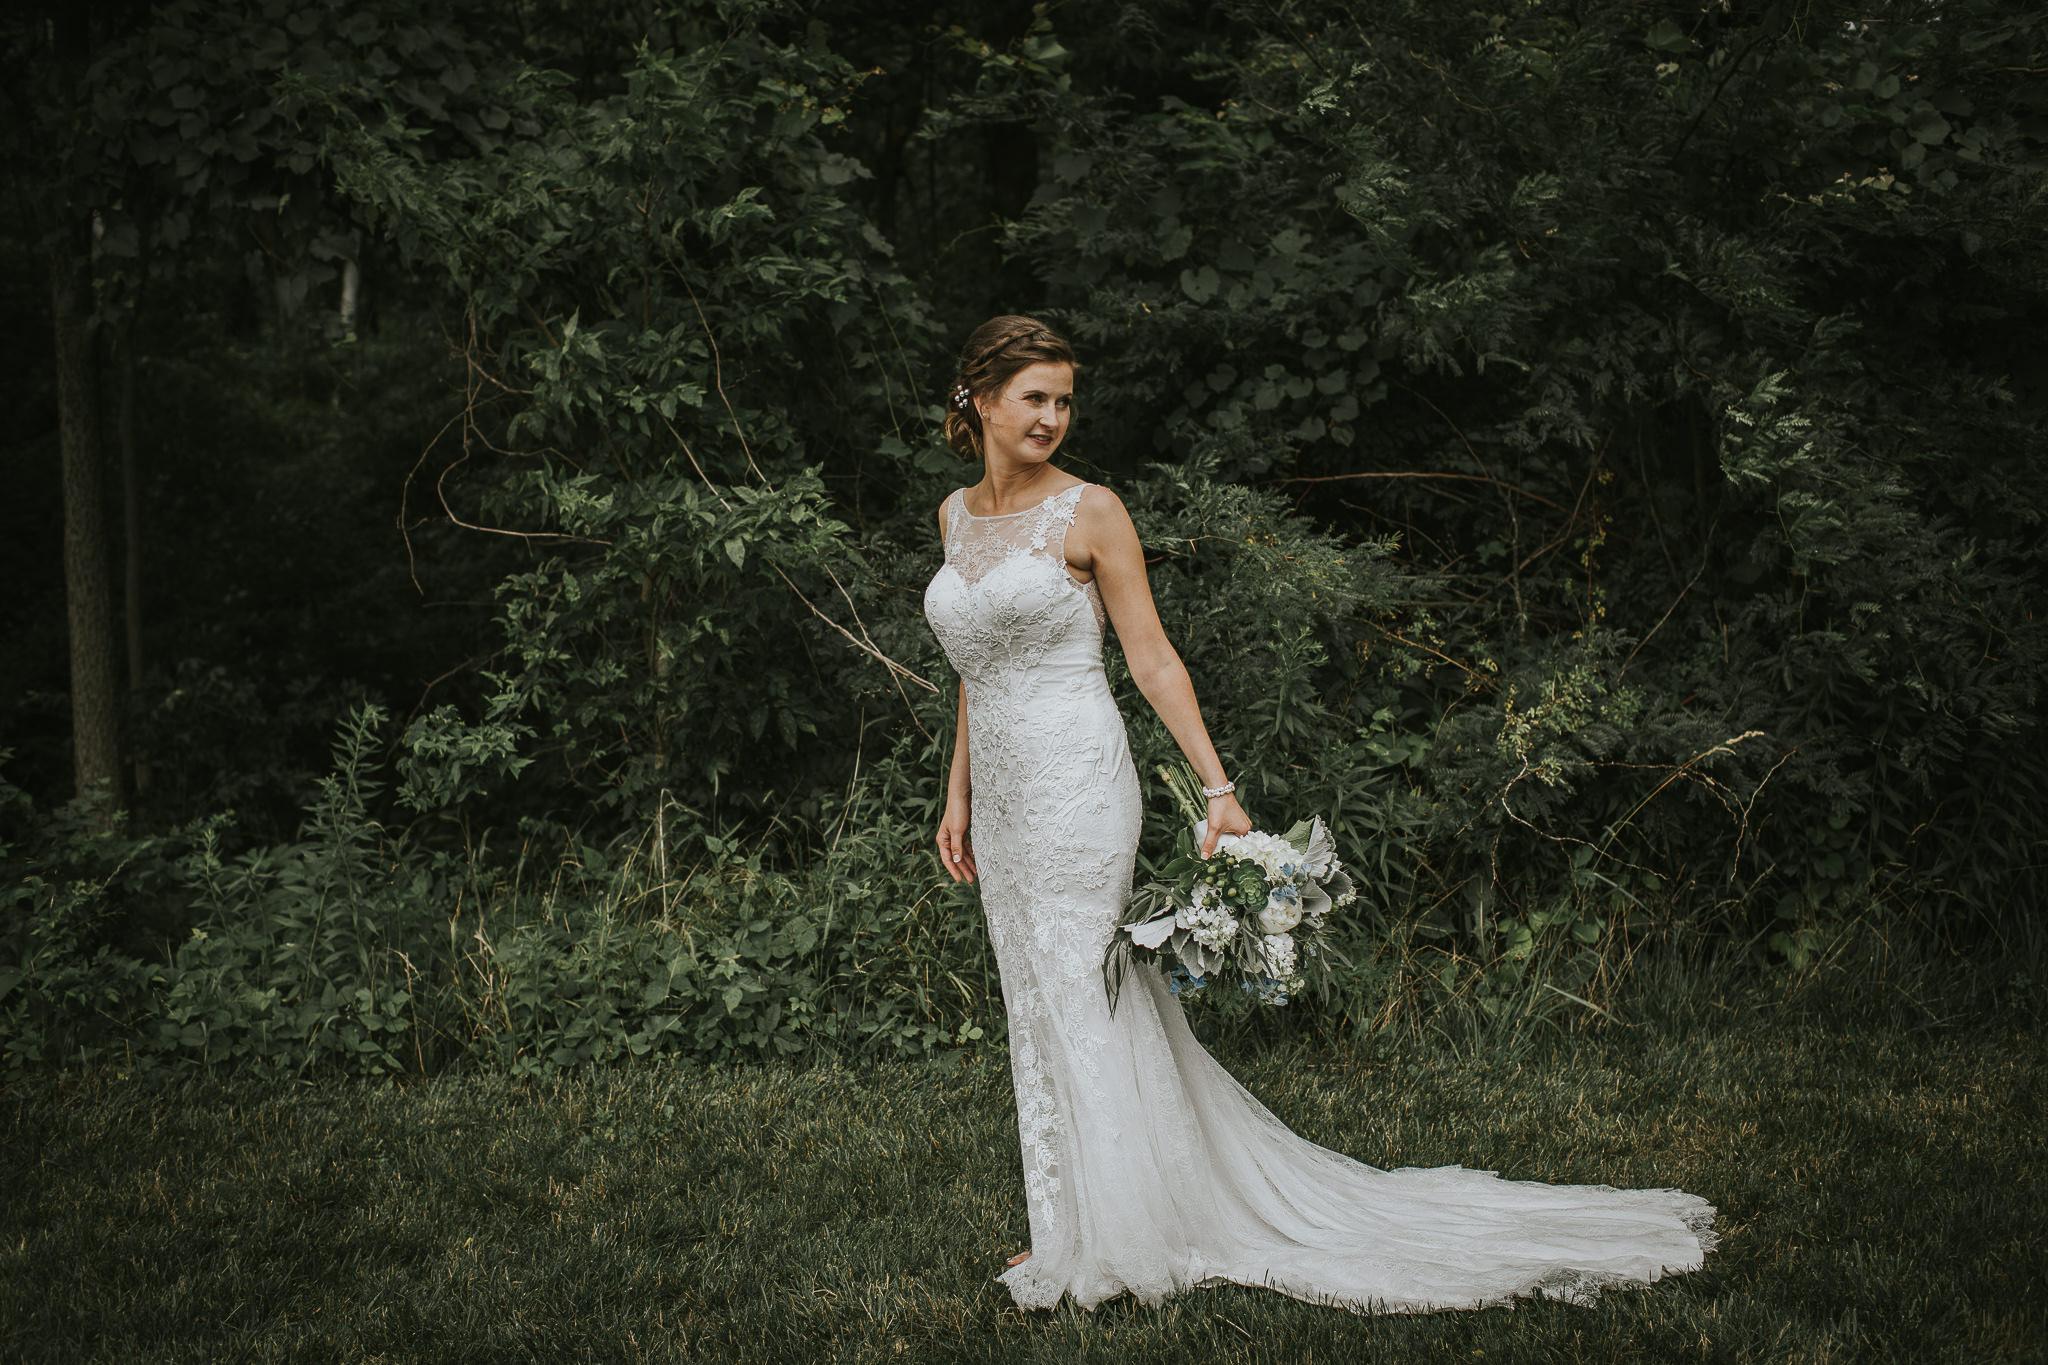 Sycamore at Mallow Run Wedding